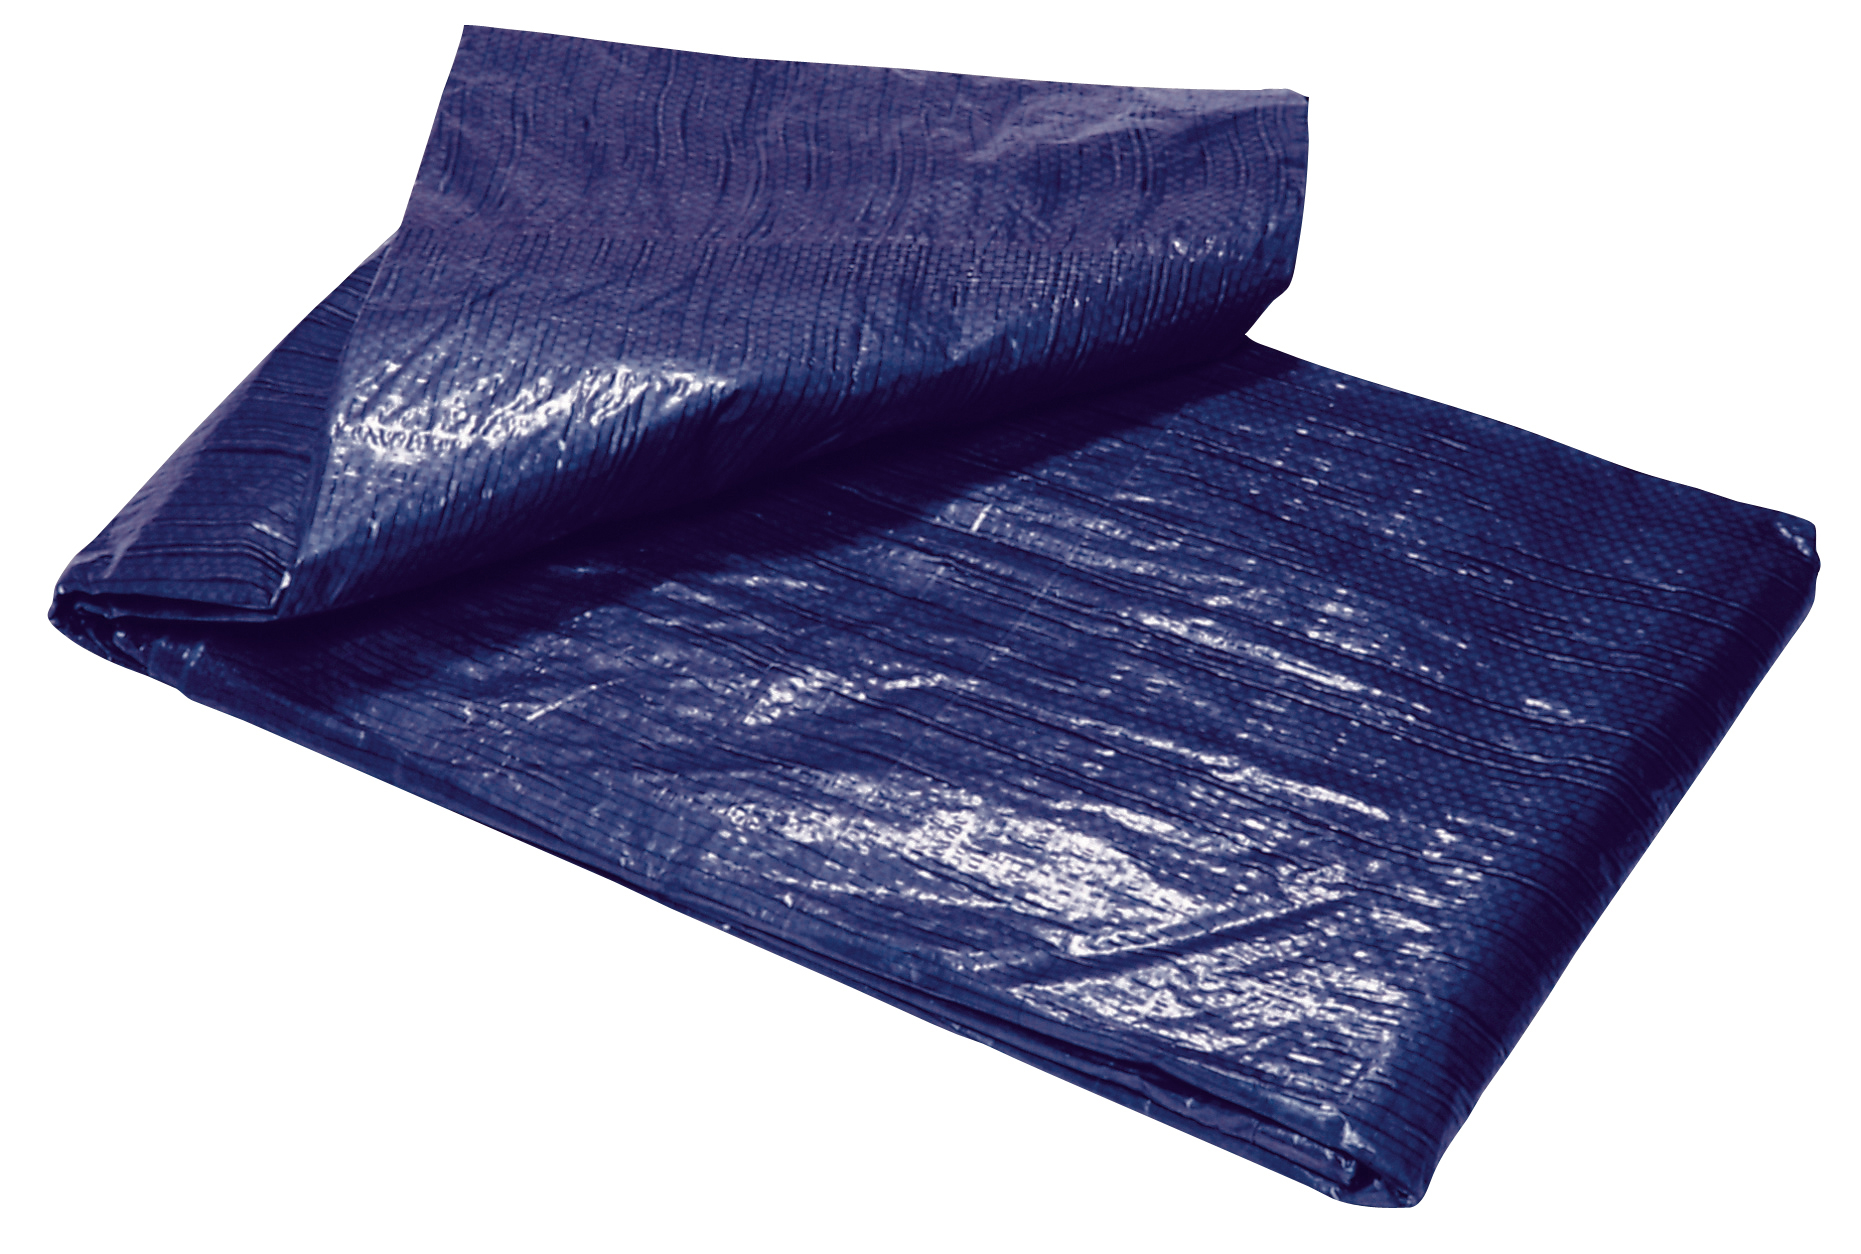 Plachta Tarpaulin Standard 03x04, prekrývacia, 80 g/m2, modrá